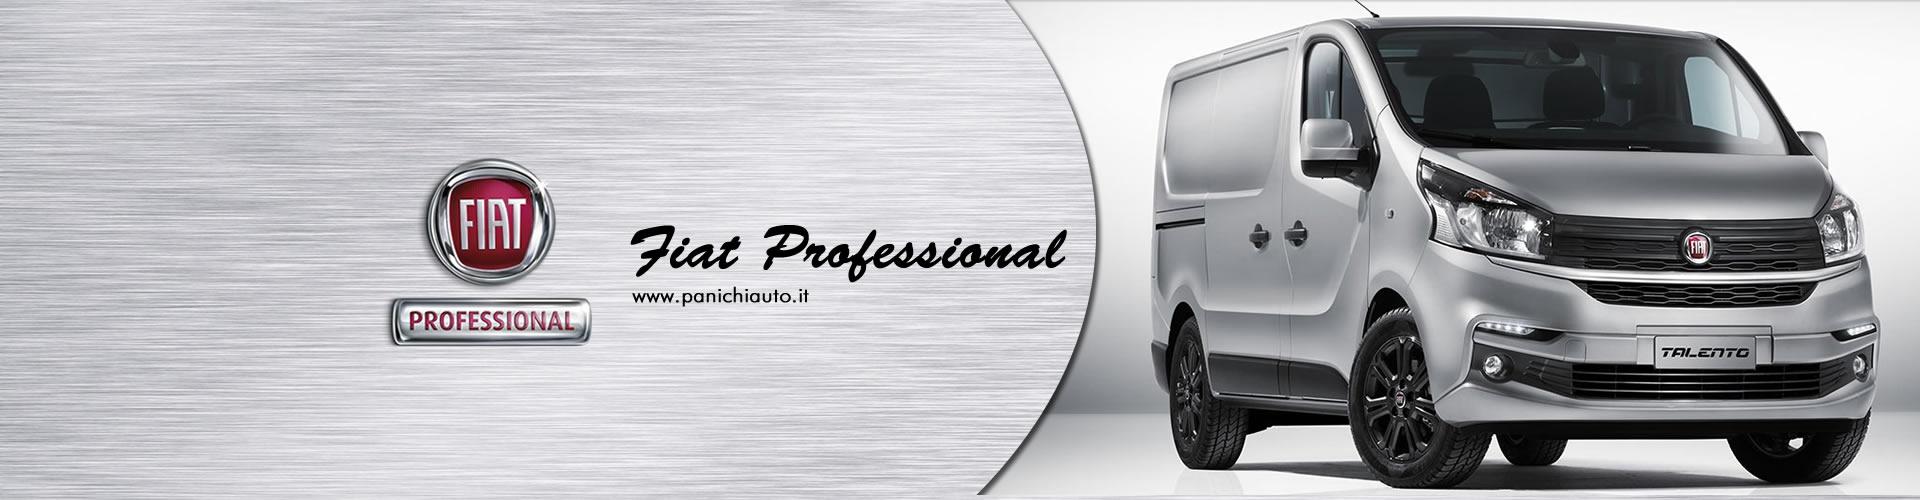 panichi_auto_cortona_fiat_professional